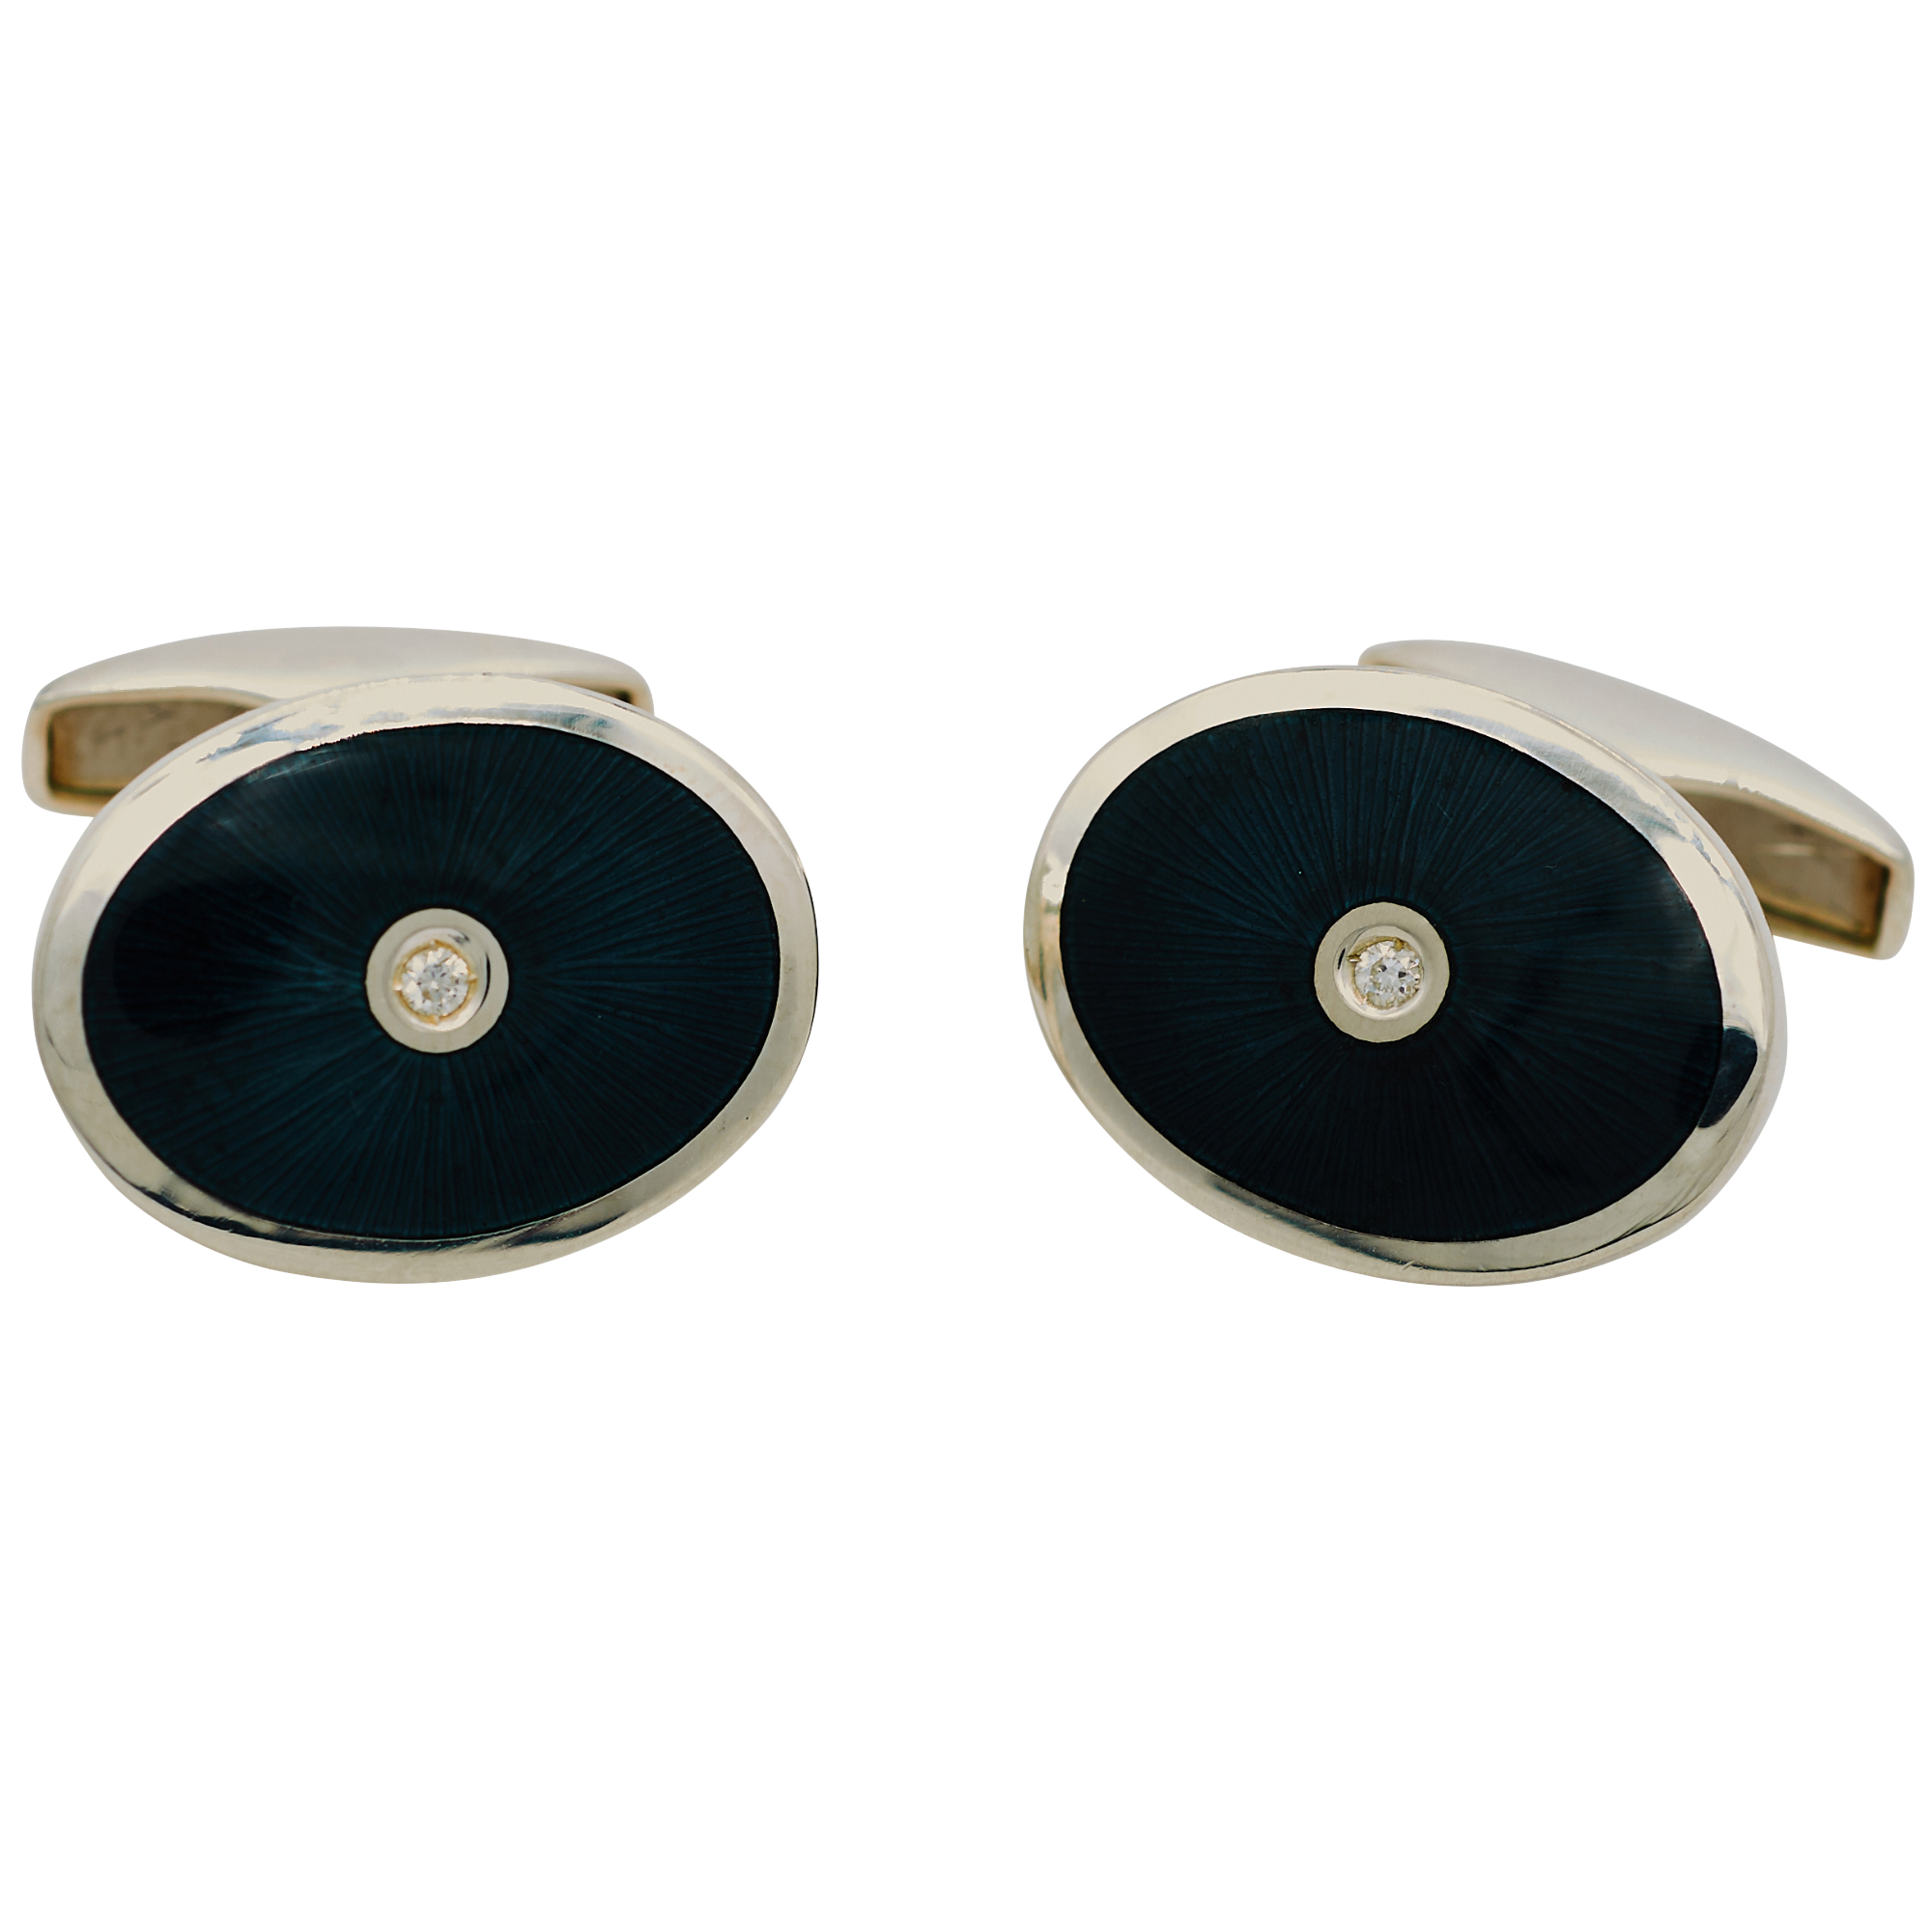 Sterling Silver Black Enamel Oval Cufflinks with Diamond Centre